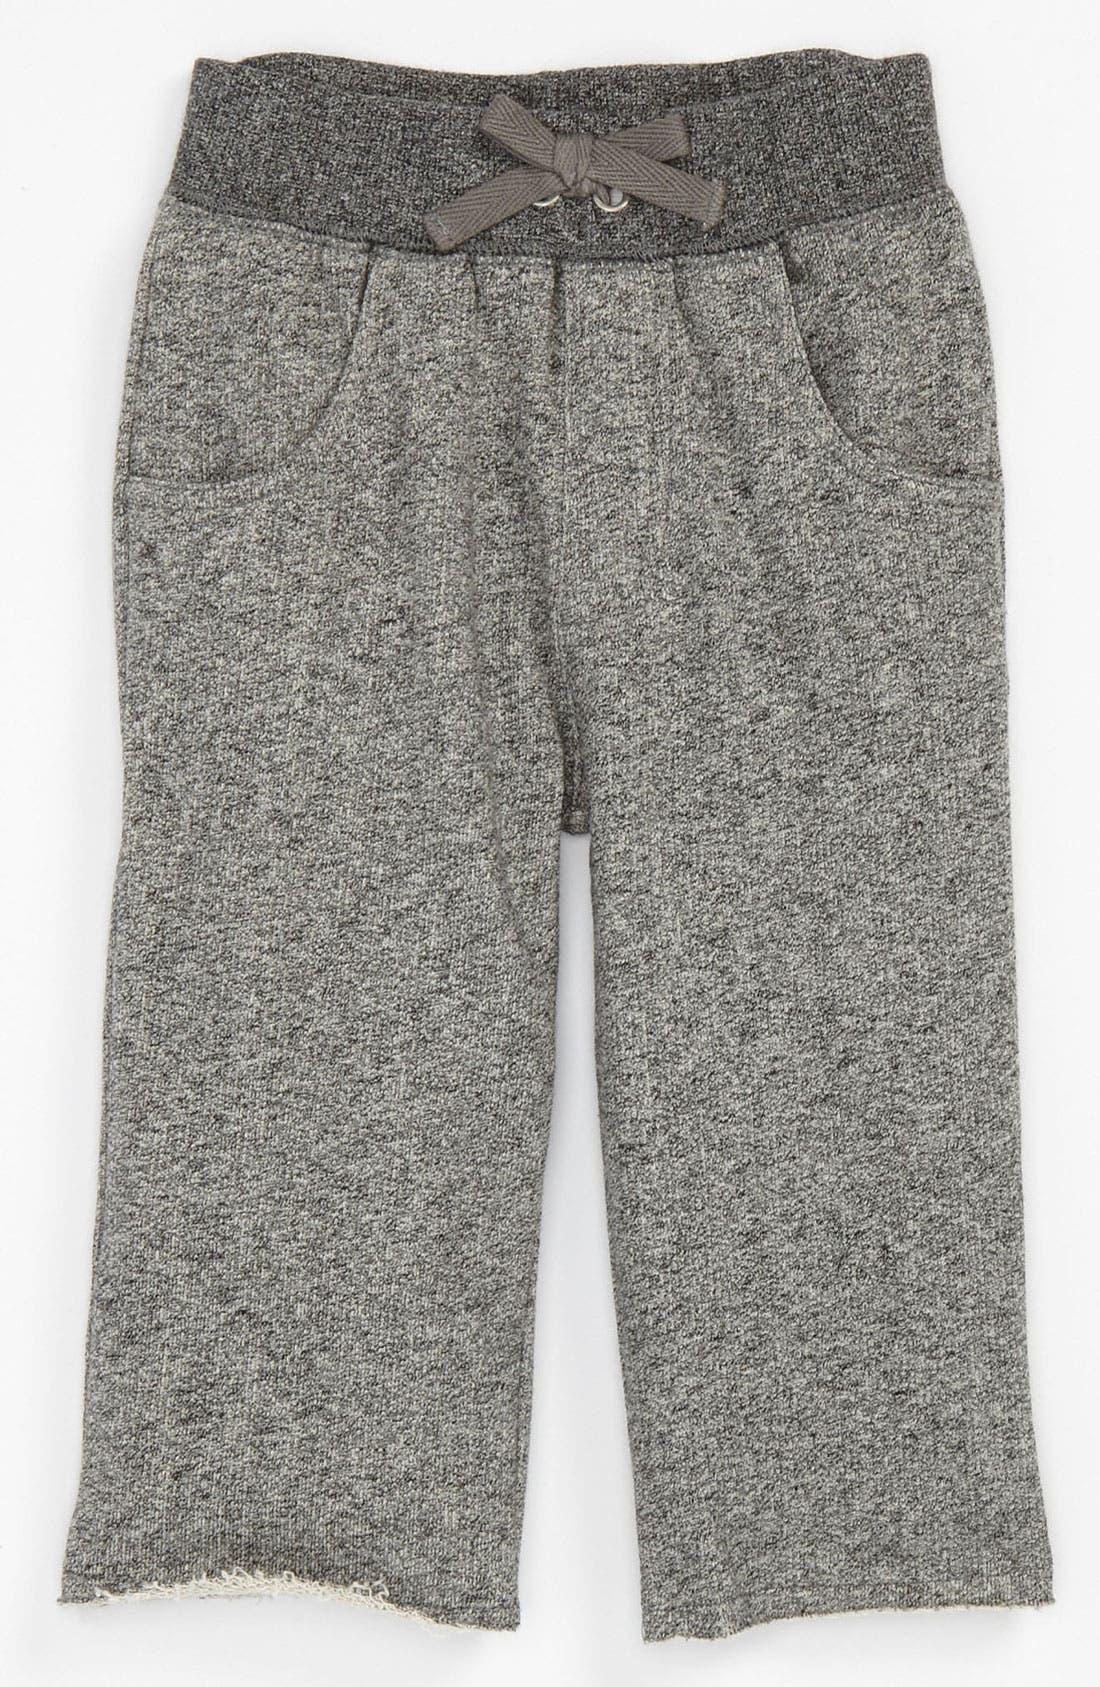 Alternate Image 1 Selected - Peek 'Caiden' Pants (Infant)